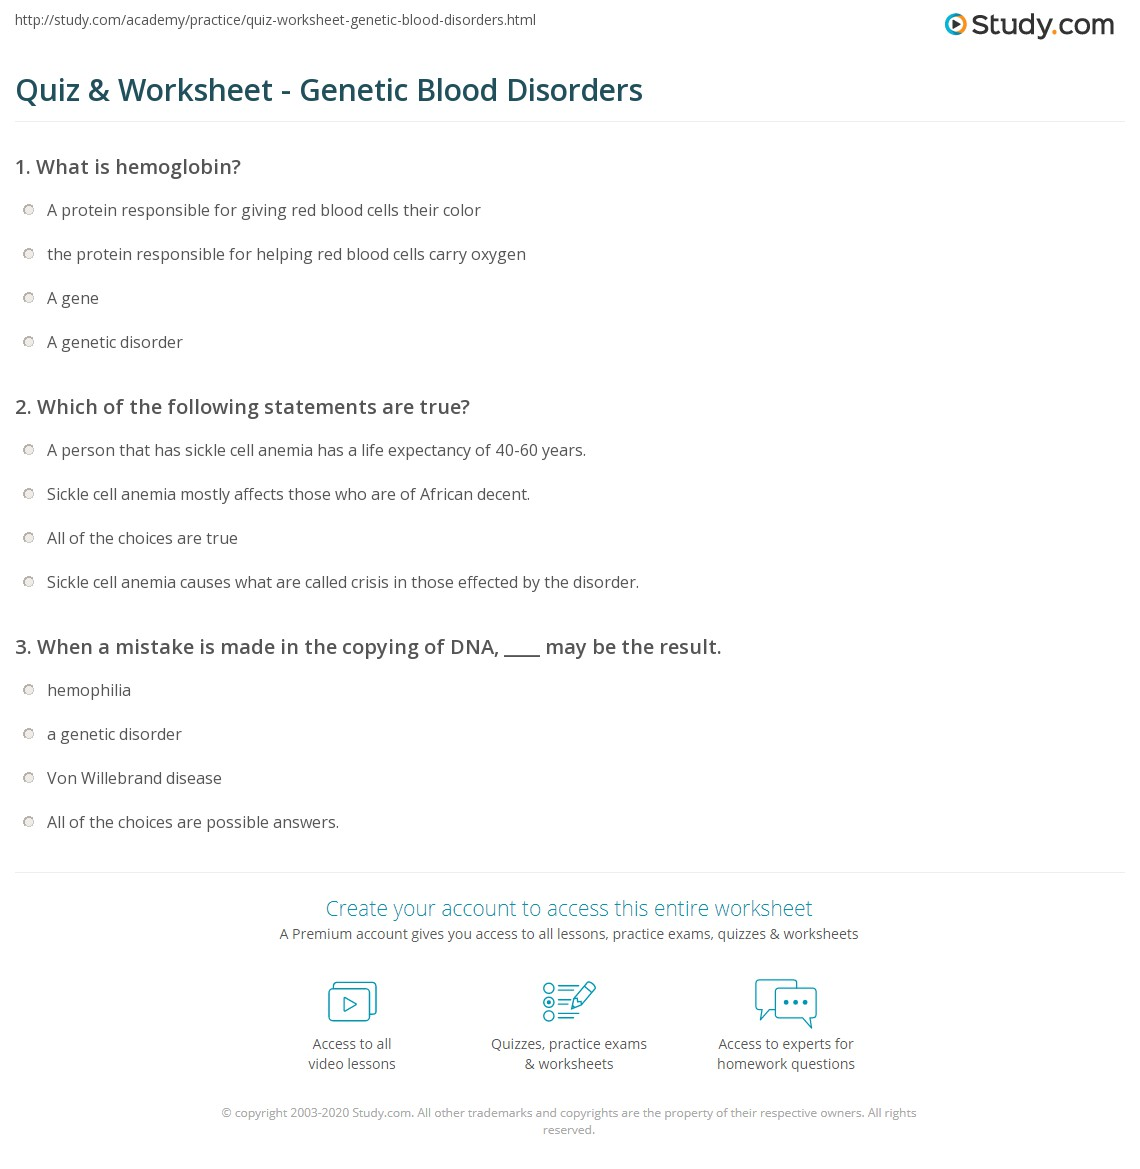 Quiz & Worksheet - Genetic Blood Disorders | Study.com